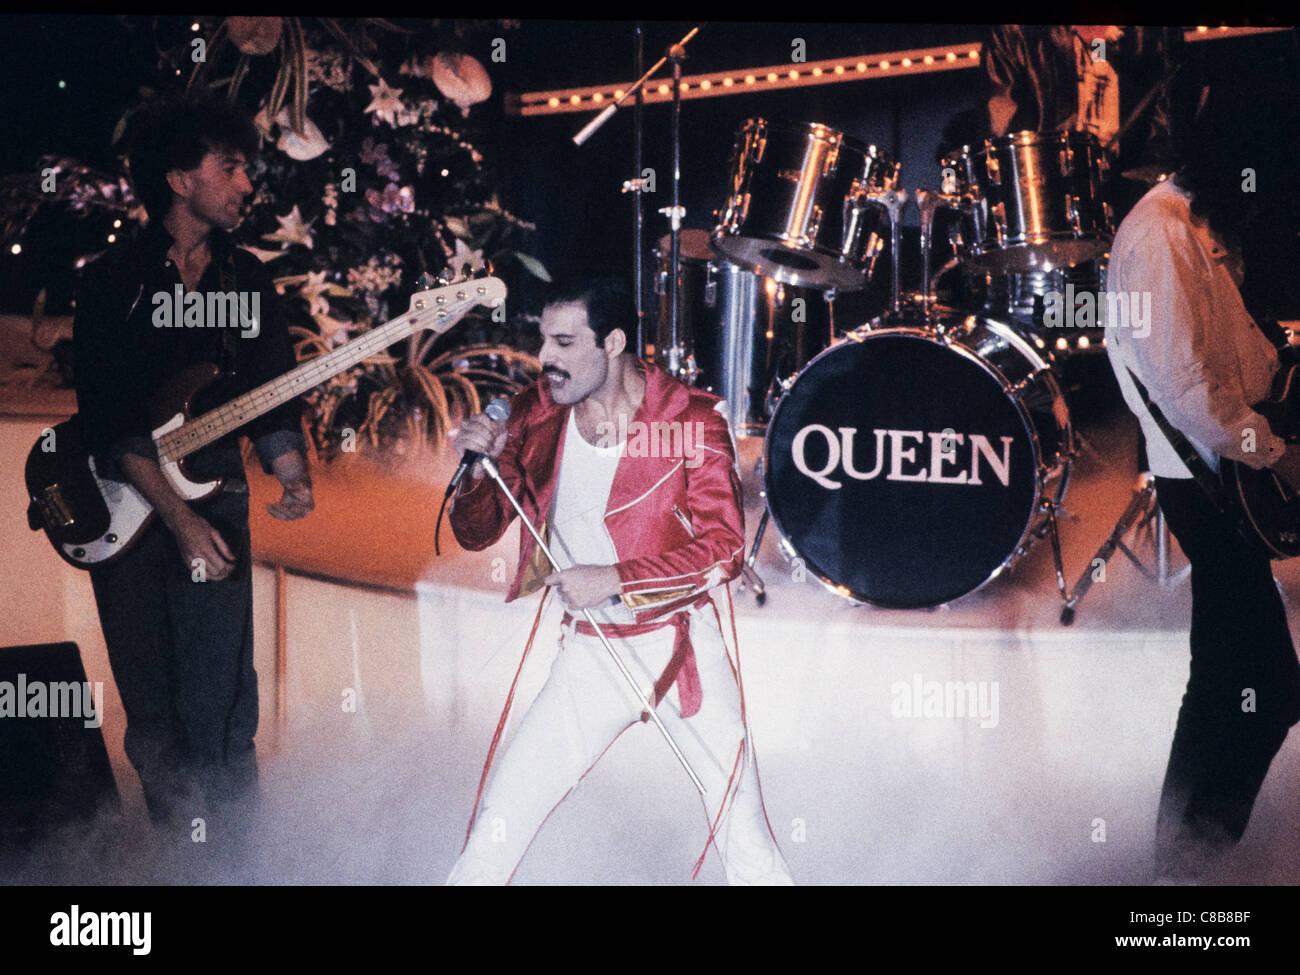 queen,Freddie Mercury - Stock Image